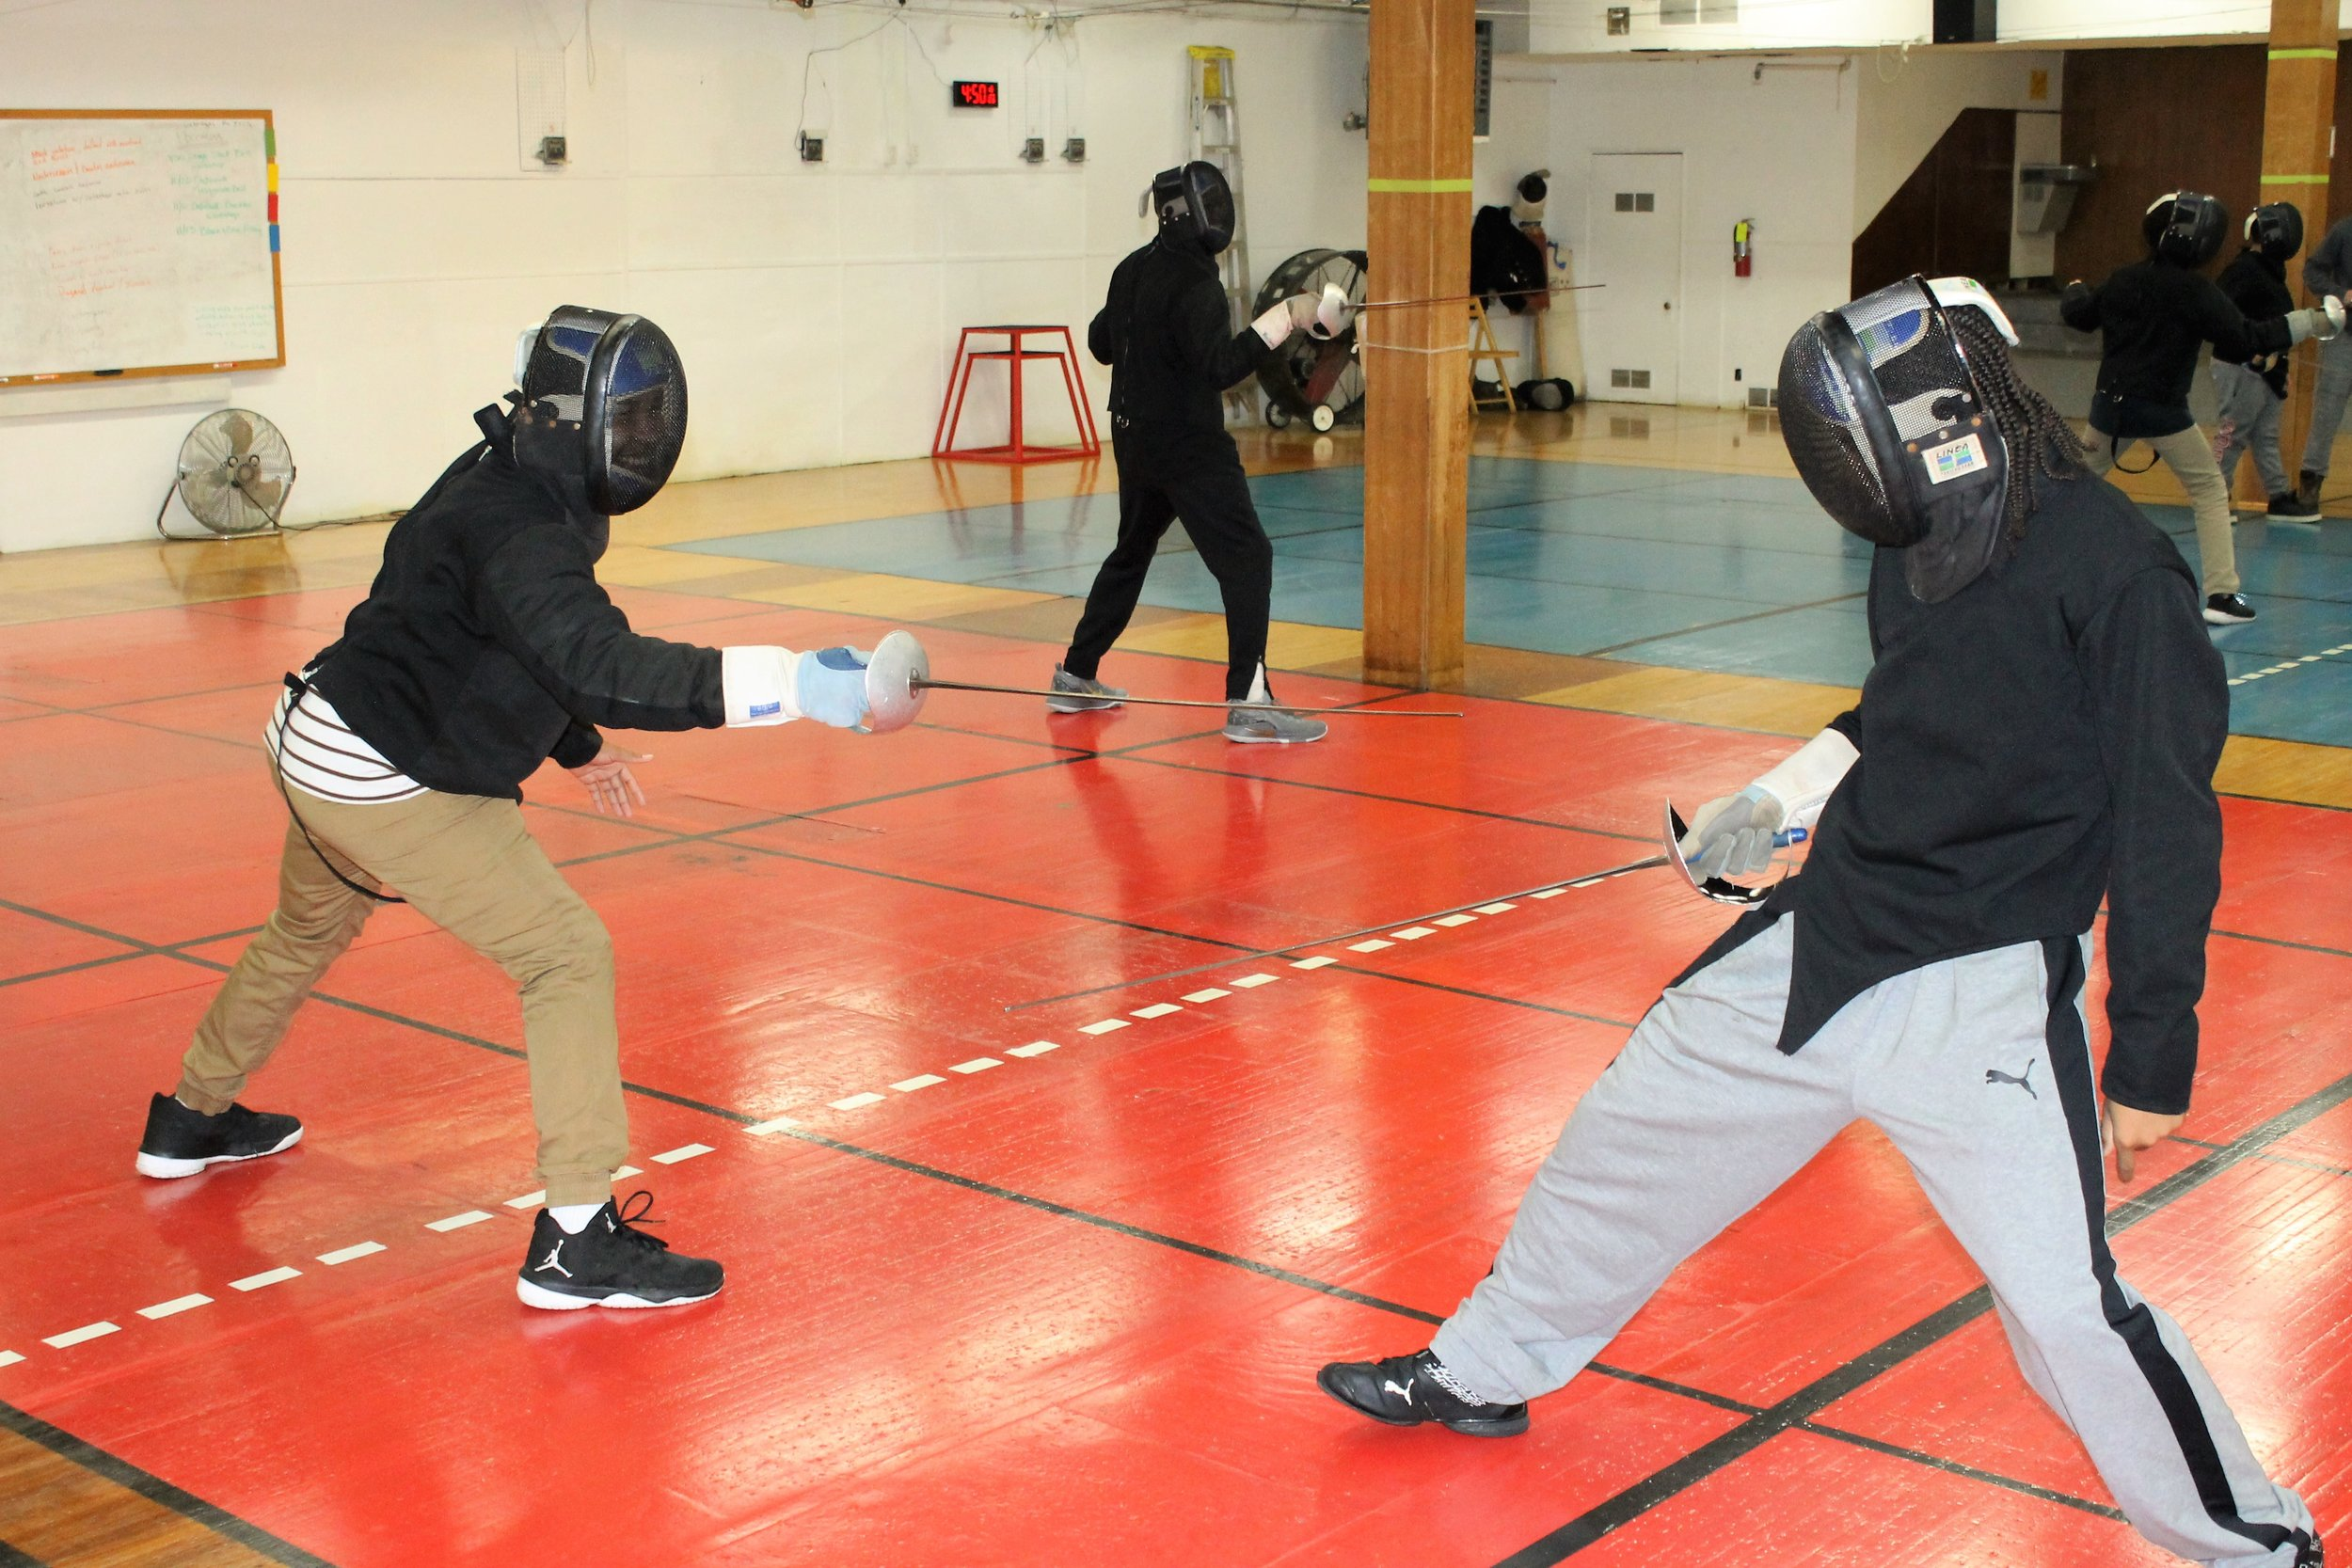 New Lens Urban Mentoring Society with Minnesota Swords Club Fencing #NewLensSociety 10.JPG